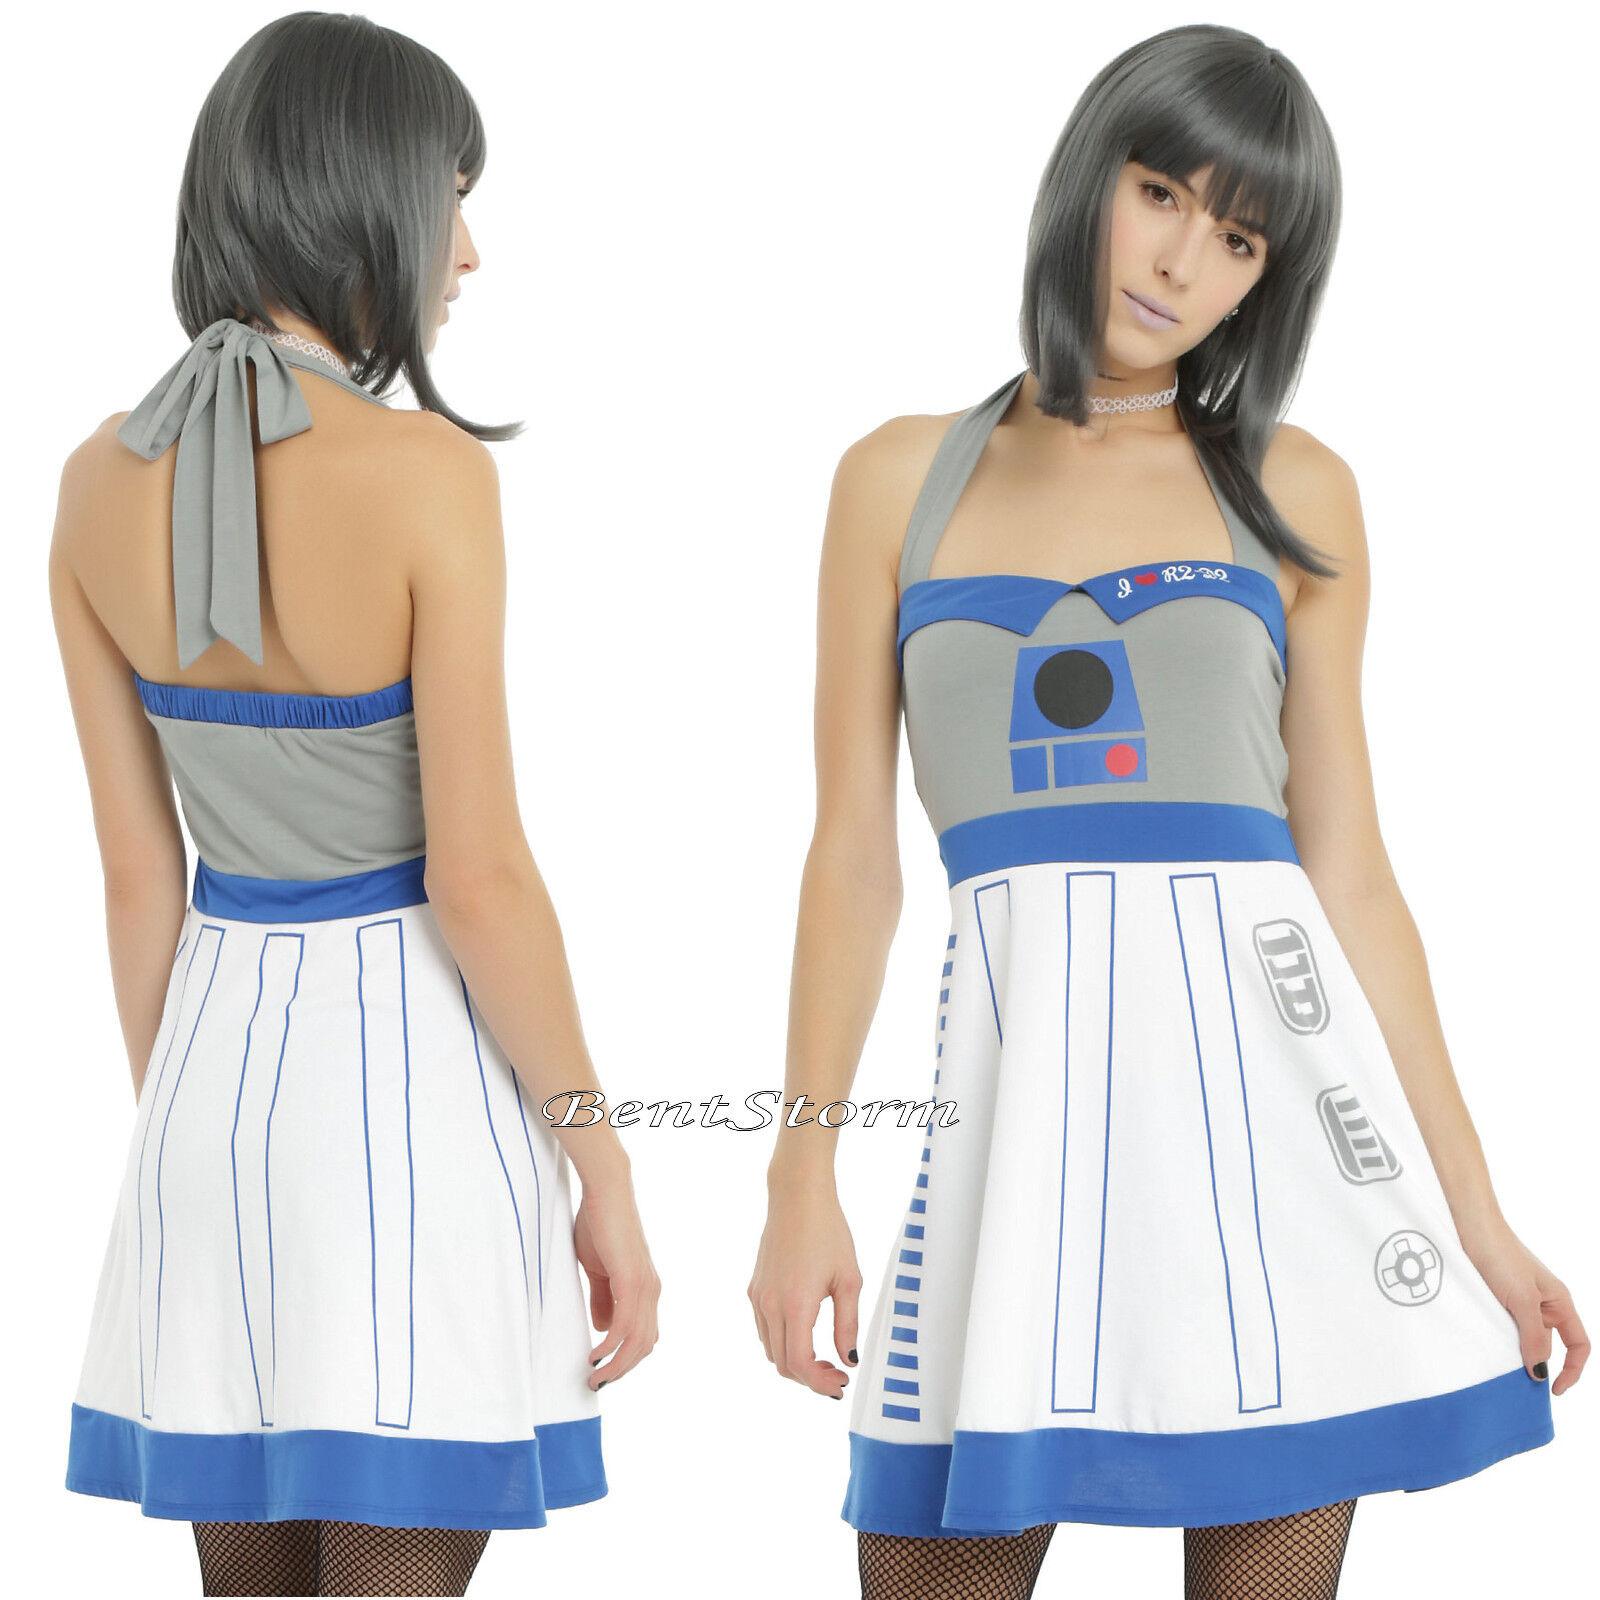 Star Wars Her Universe R2-D2 Robot Droid Adjustable Halter Strap Cosplay Dress